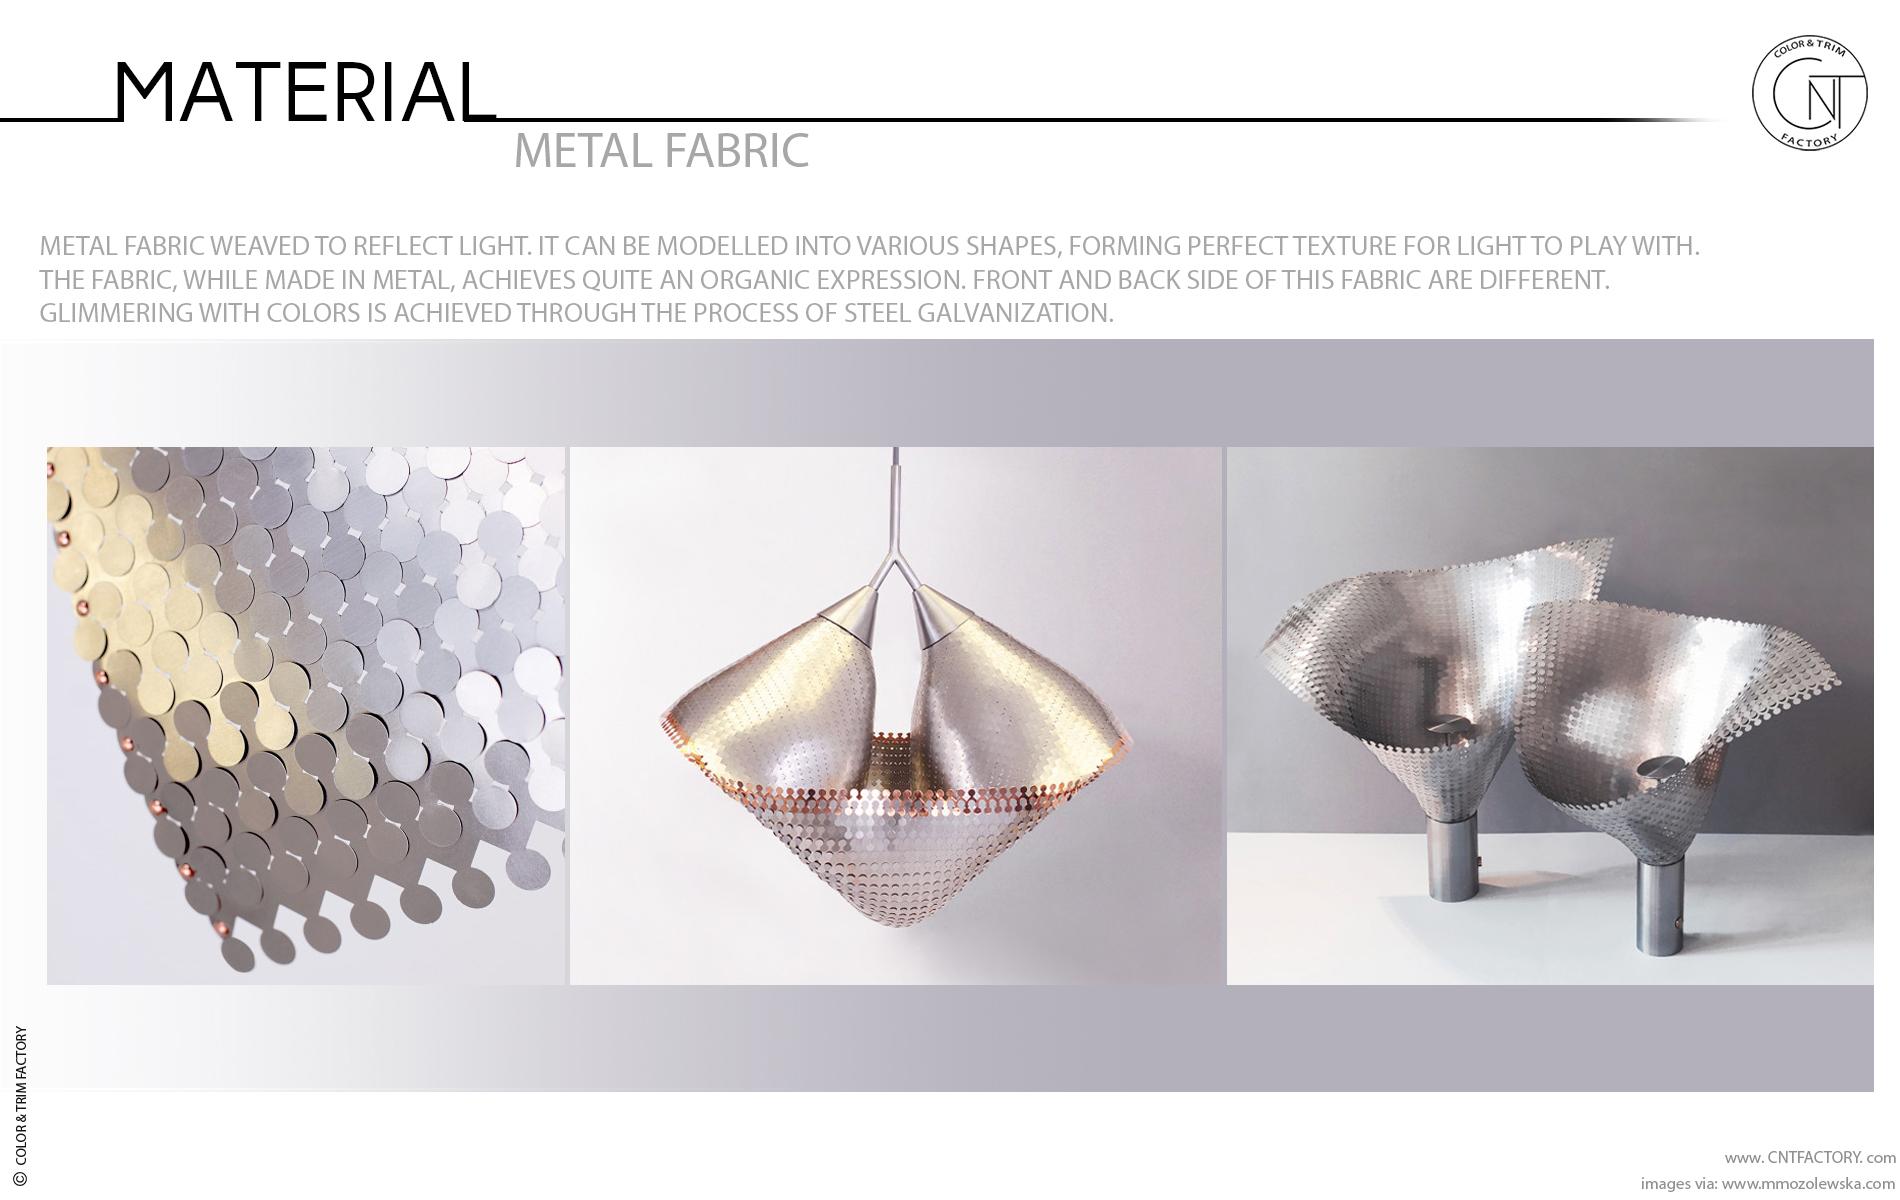 Galvanized metal fabric automotive color trim design